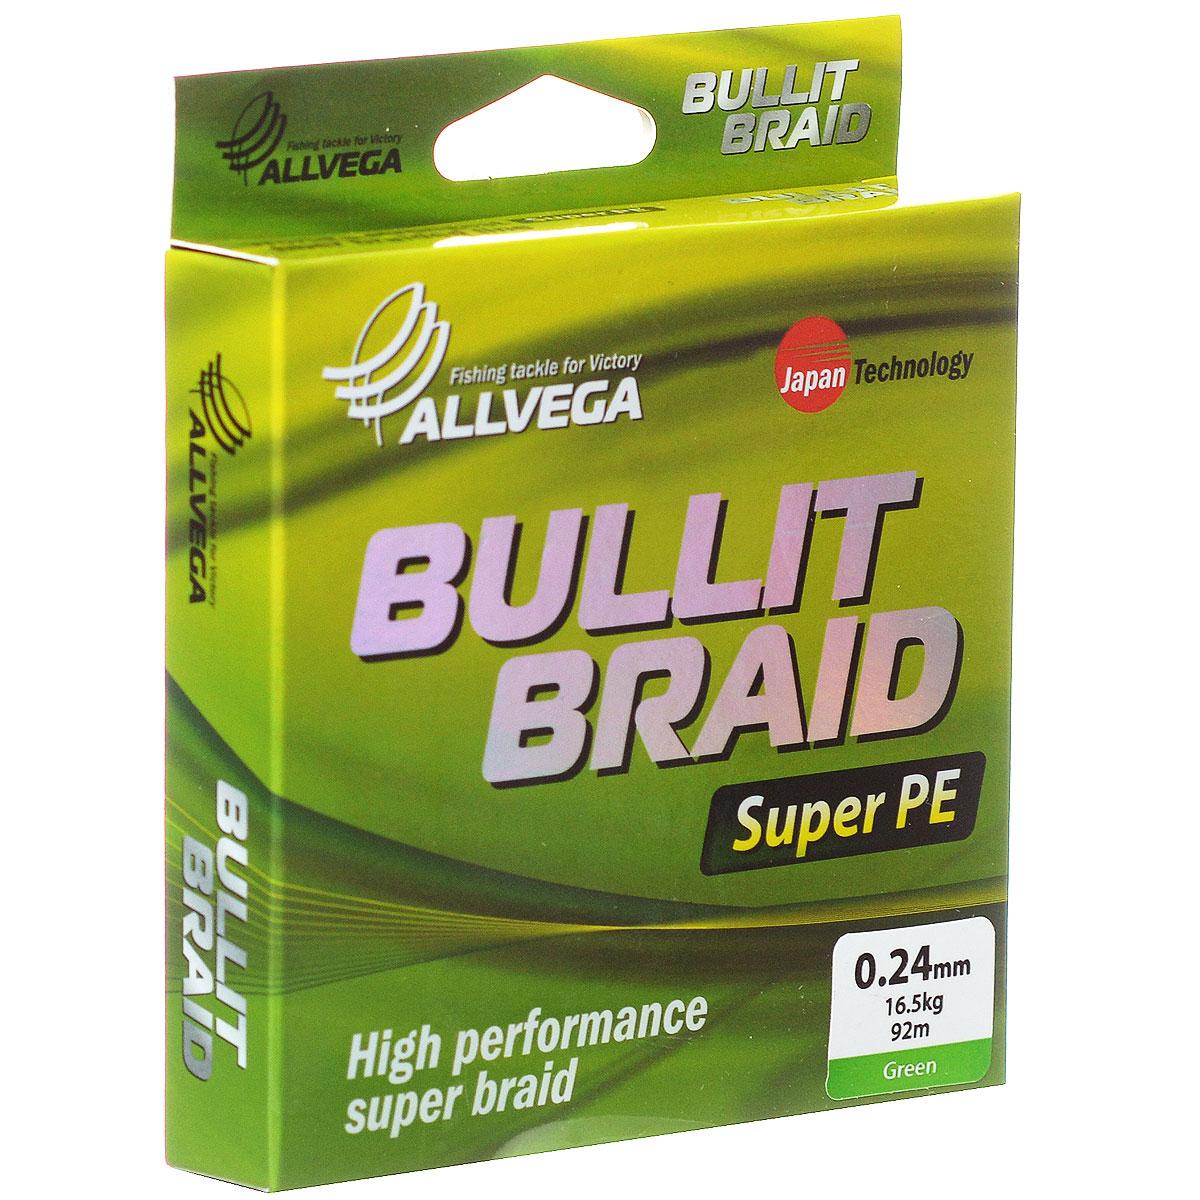 Леска плетеная Allvega Bullit Braid, цвет: темно-зеленый, 92 м, 0,24 мм, 16,5 кг